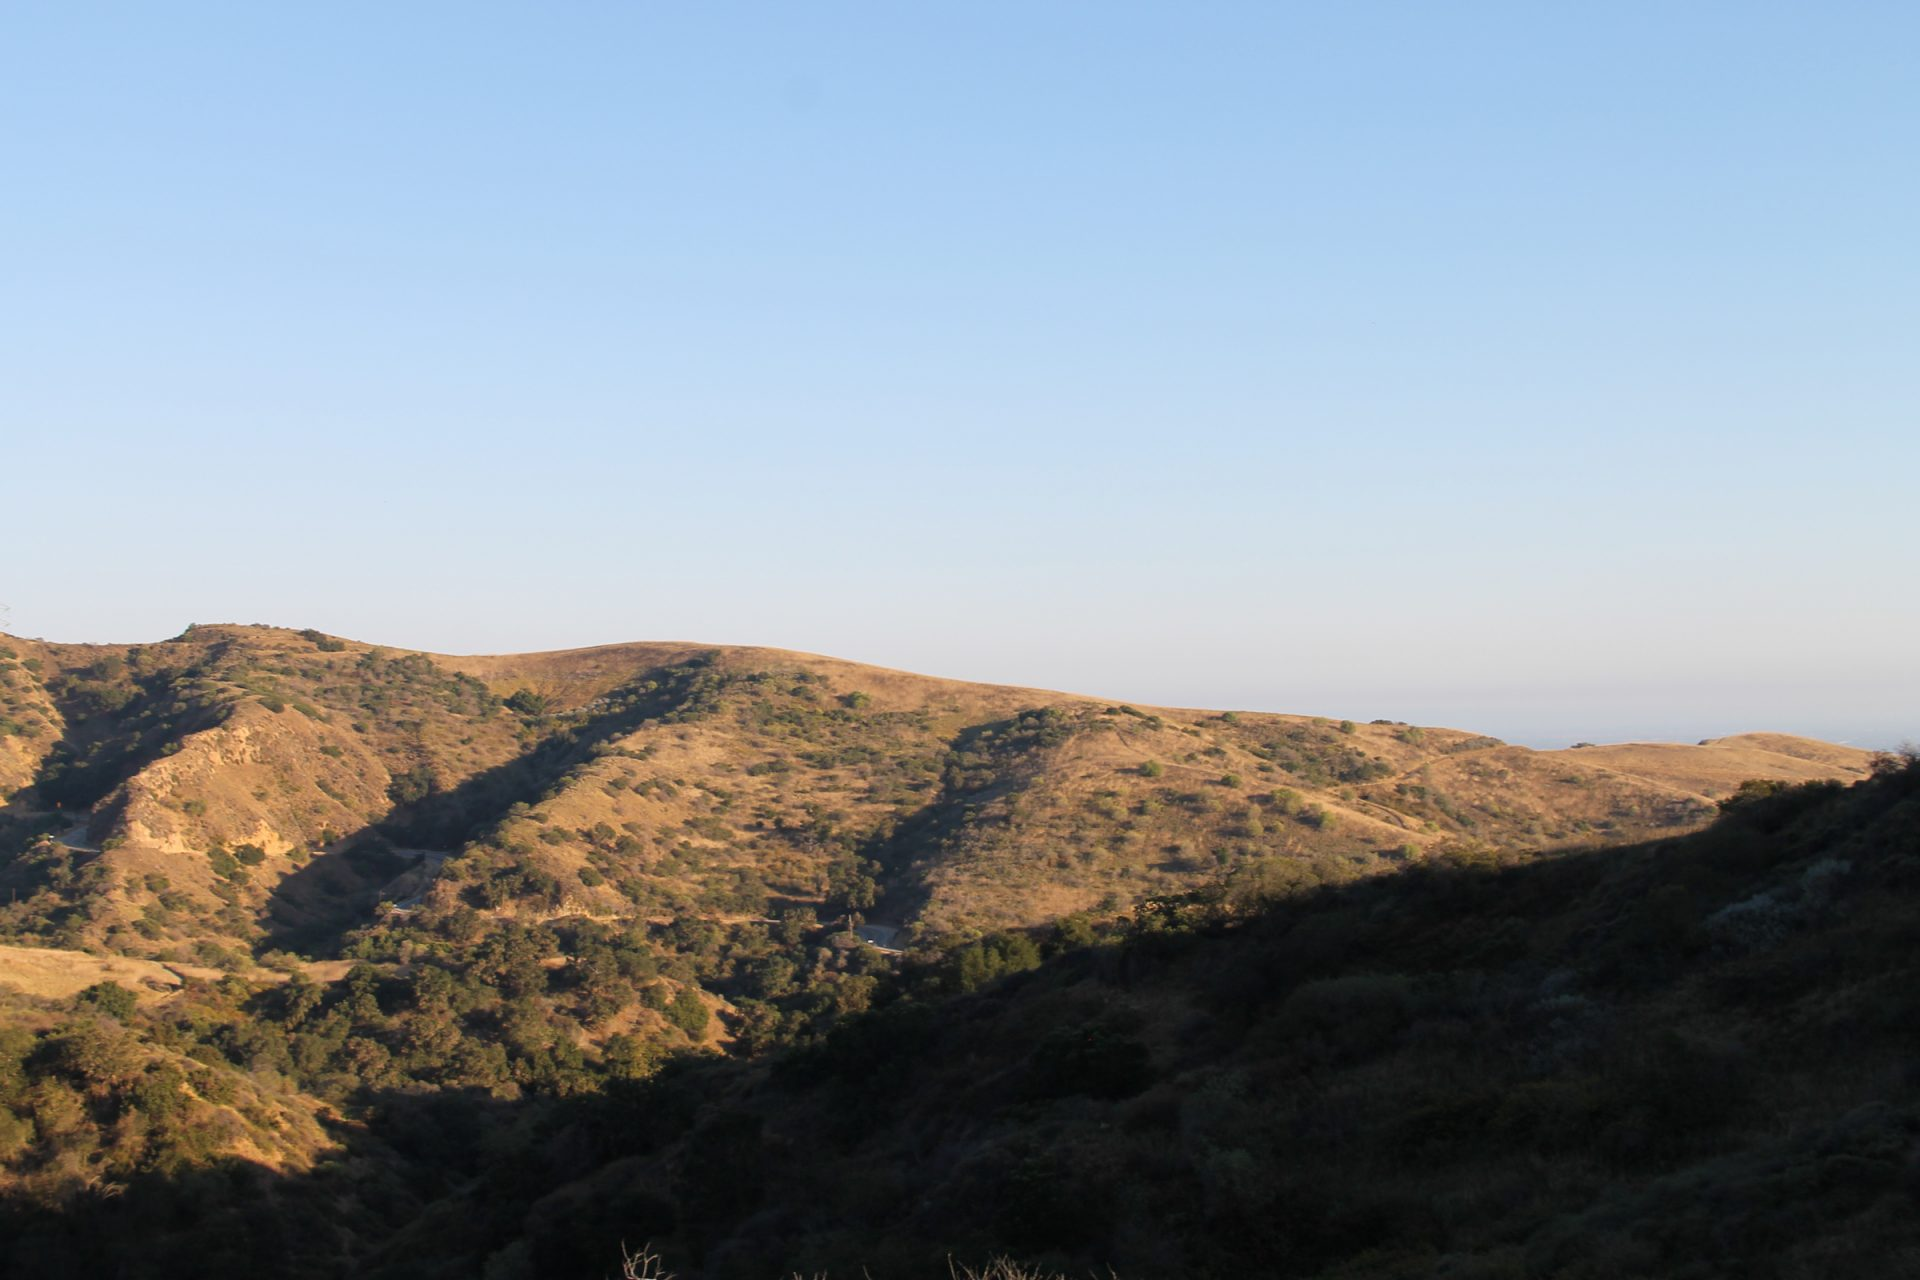 Dry Hills in Sunlight & Shadow